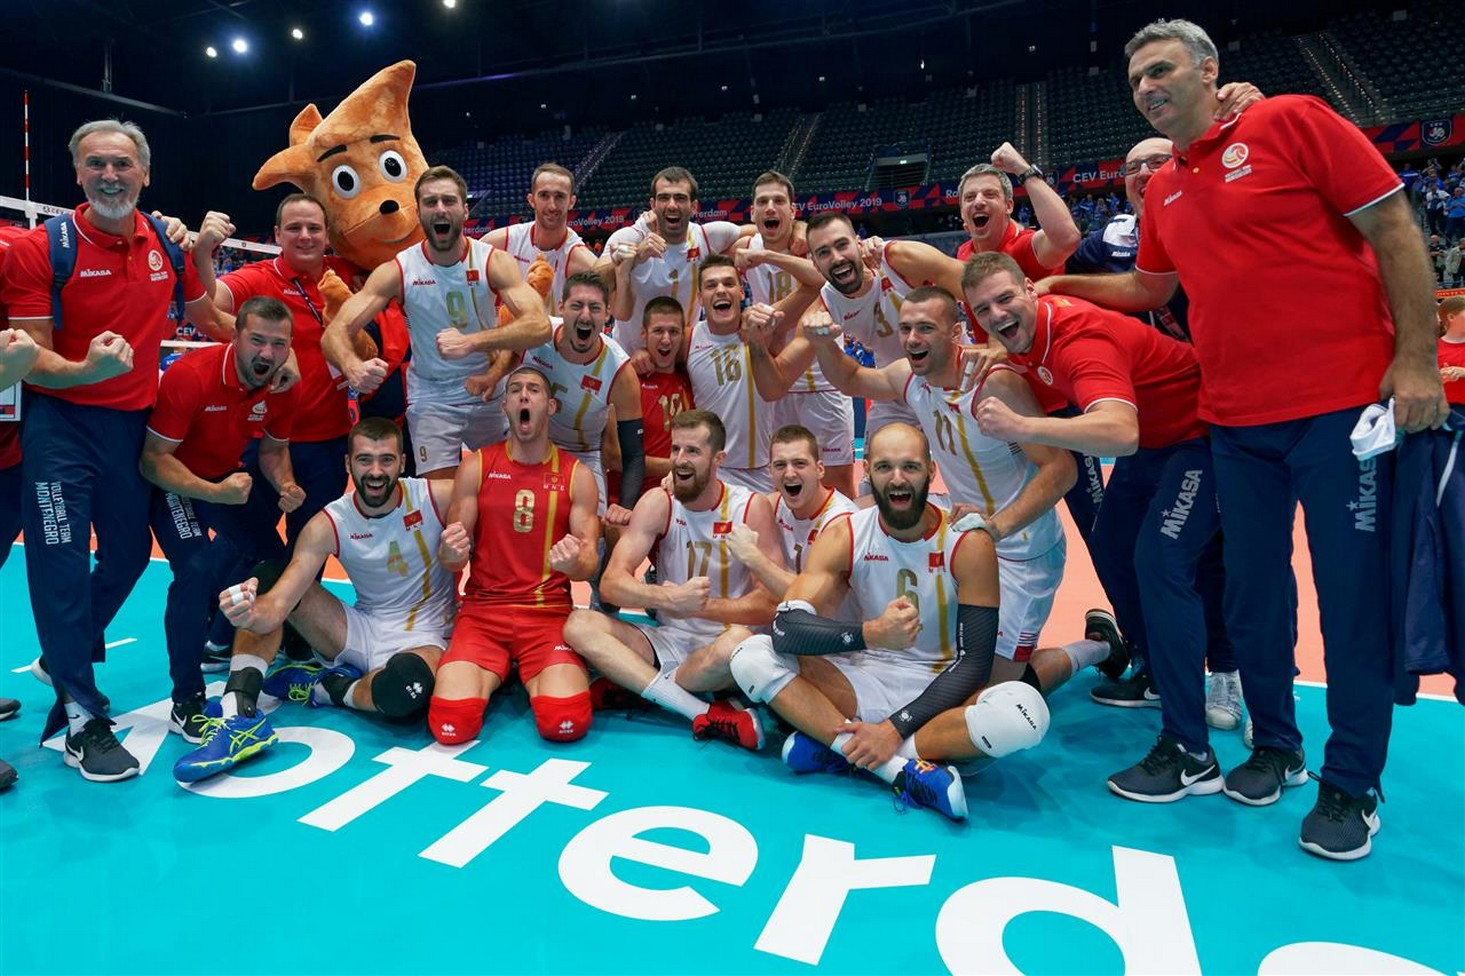 crna gora estonija seniori reprezentacija odbojkasi evropsko prvenstvo 015